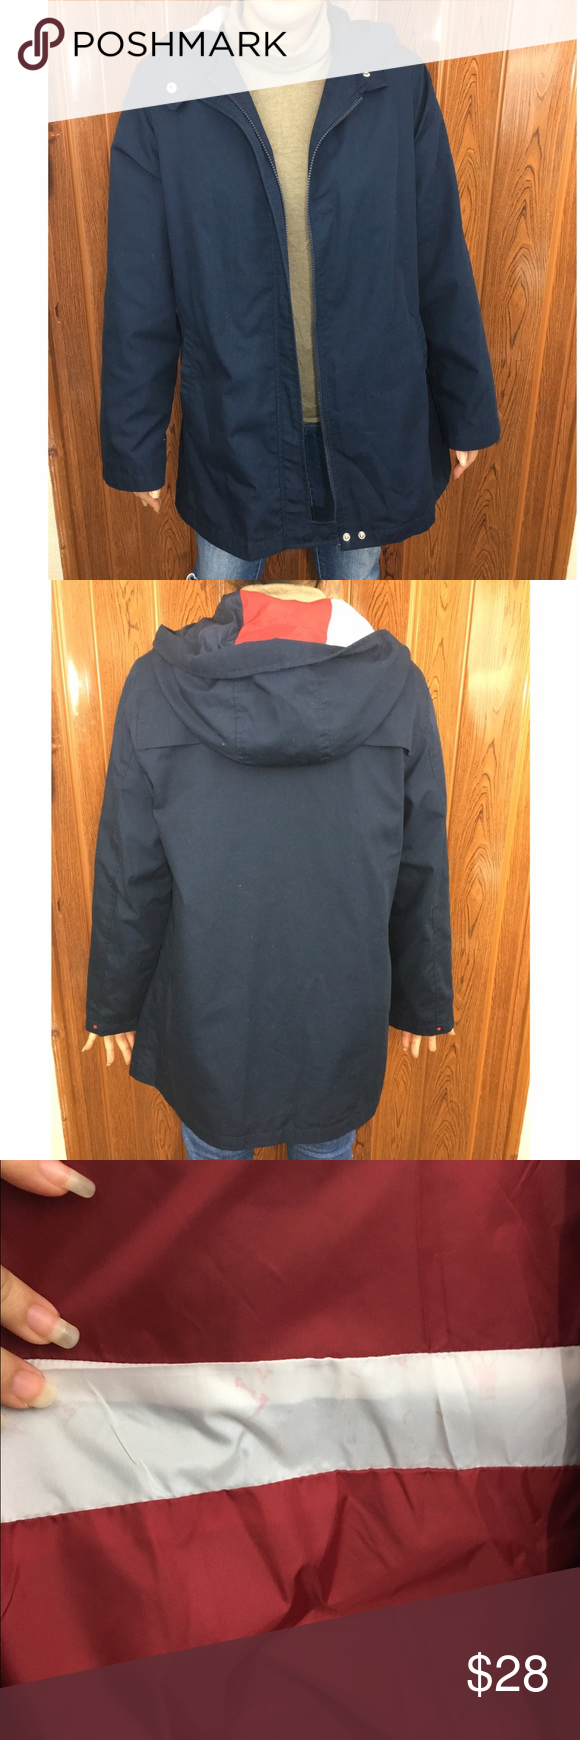 Vintage Izzi Rain Coat American Flag Interior Vintage Izzi Outerwear Rain Coat In Navy Blue Interior Is An American Fla Vintage Jacket Clothes Design Raincoat [ 1740 x 580 Pixel ]